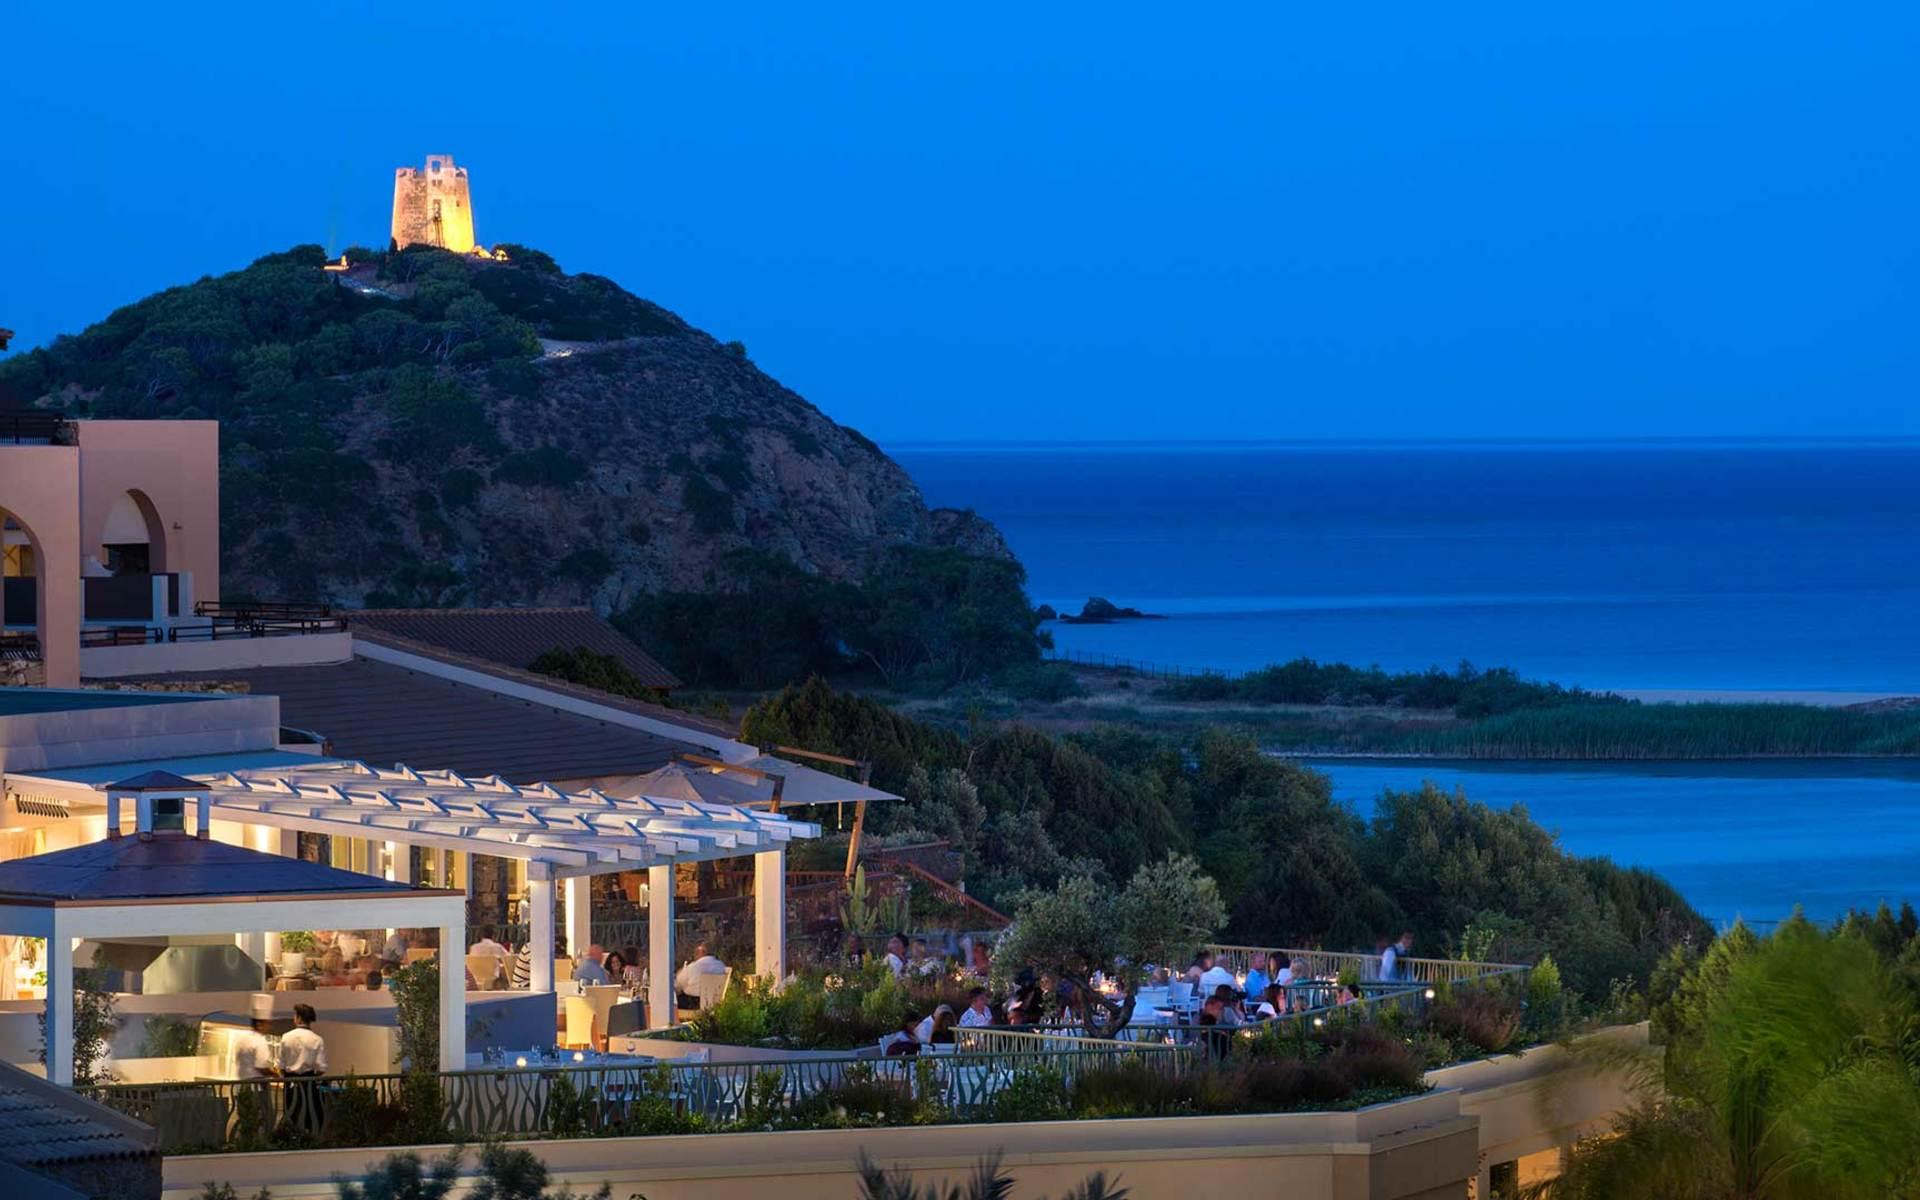 https://www.chialagunaresort.com/wp-content/uploads/2021/05/restaurant-la-terrazza.jpg